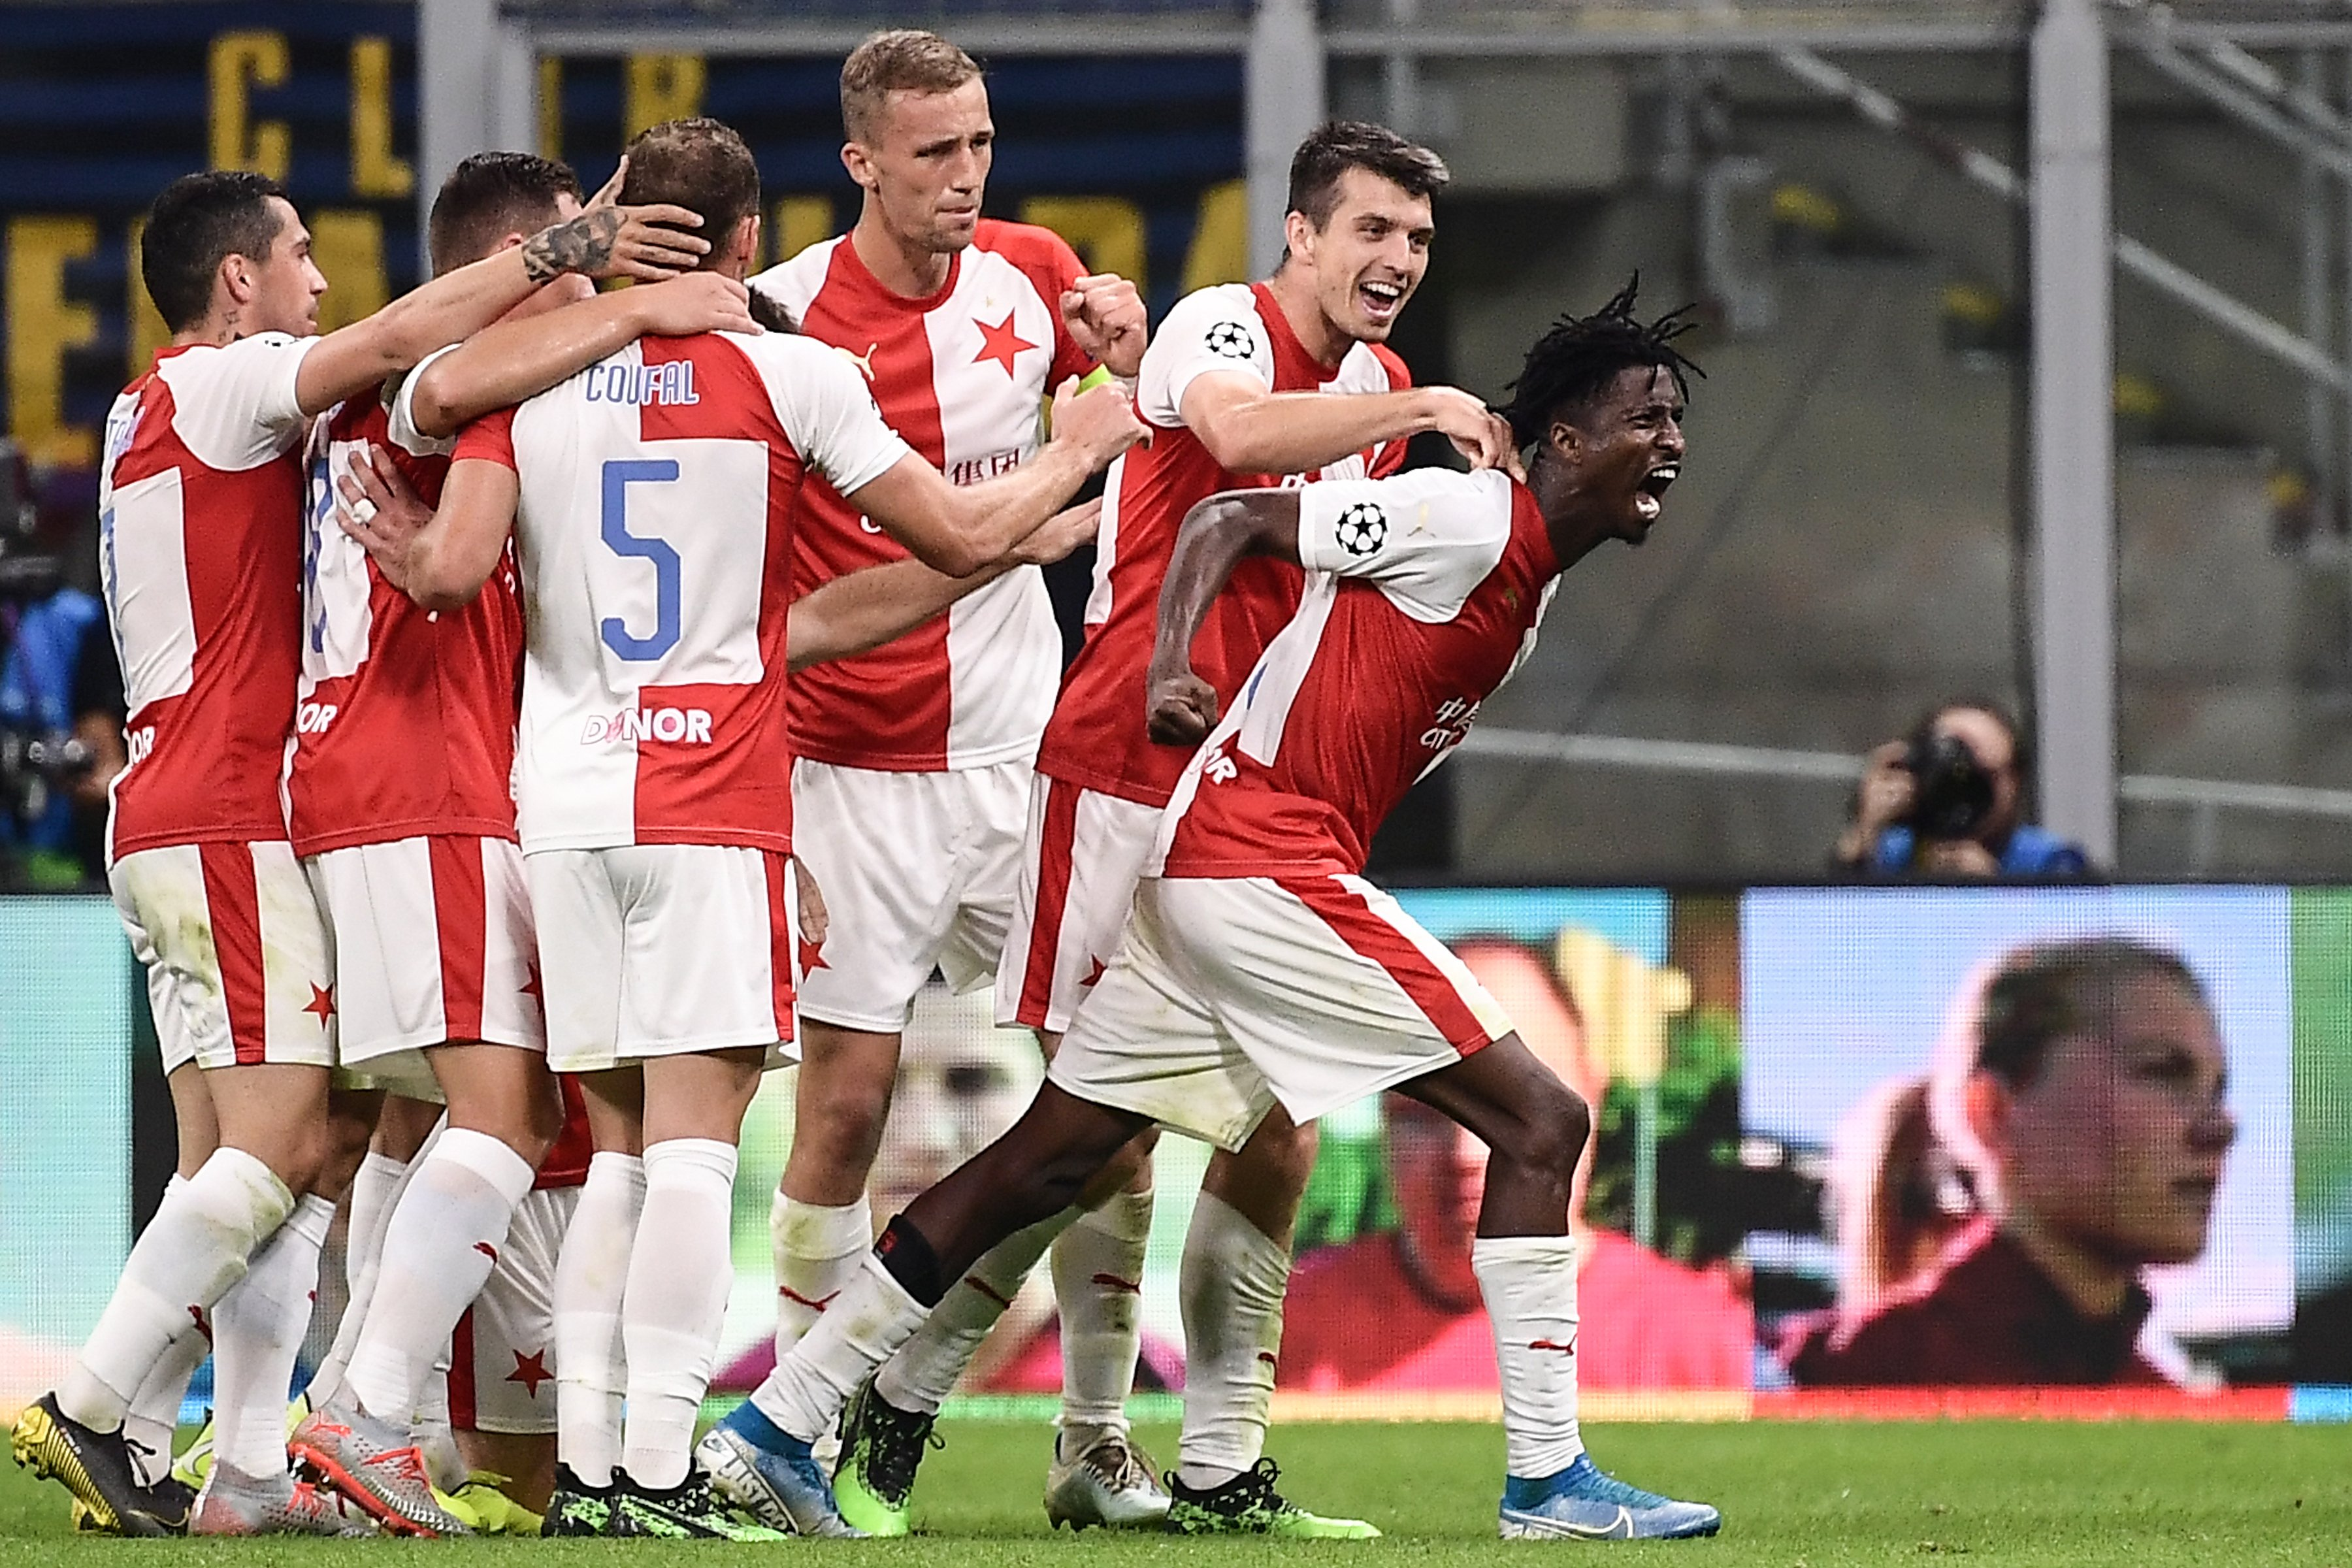 Olayinka: It's Amazing To Score On My Champions League Debut For Slavia Prague